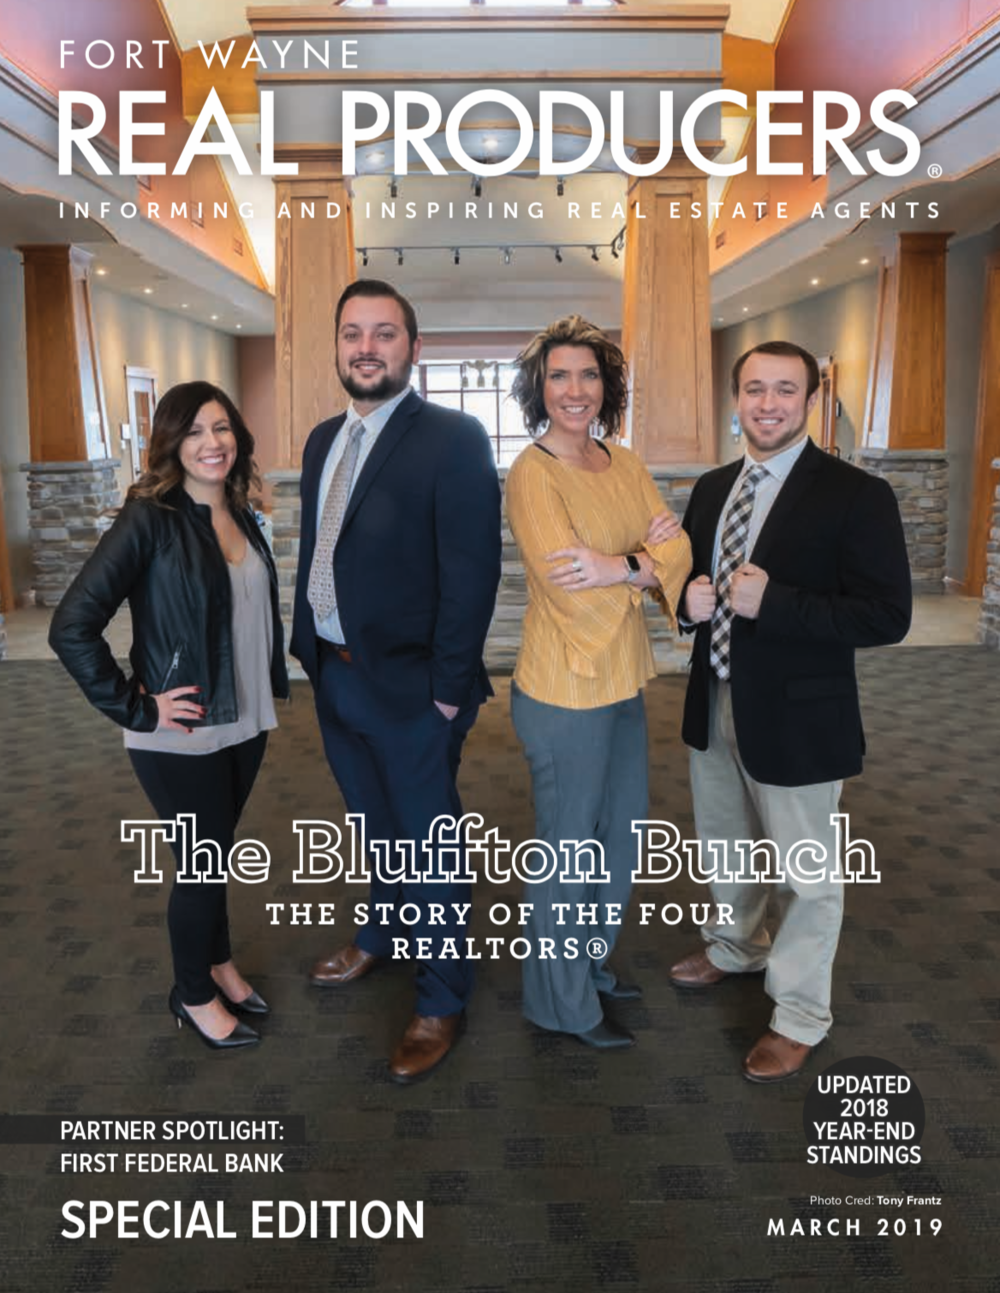 Fort Wayne Real Producers DasFort